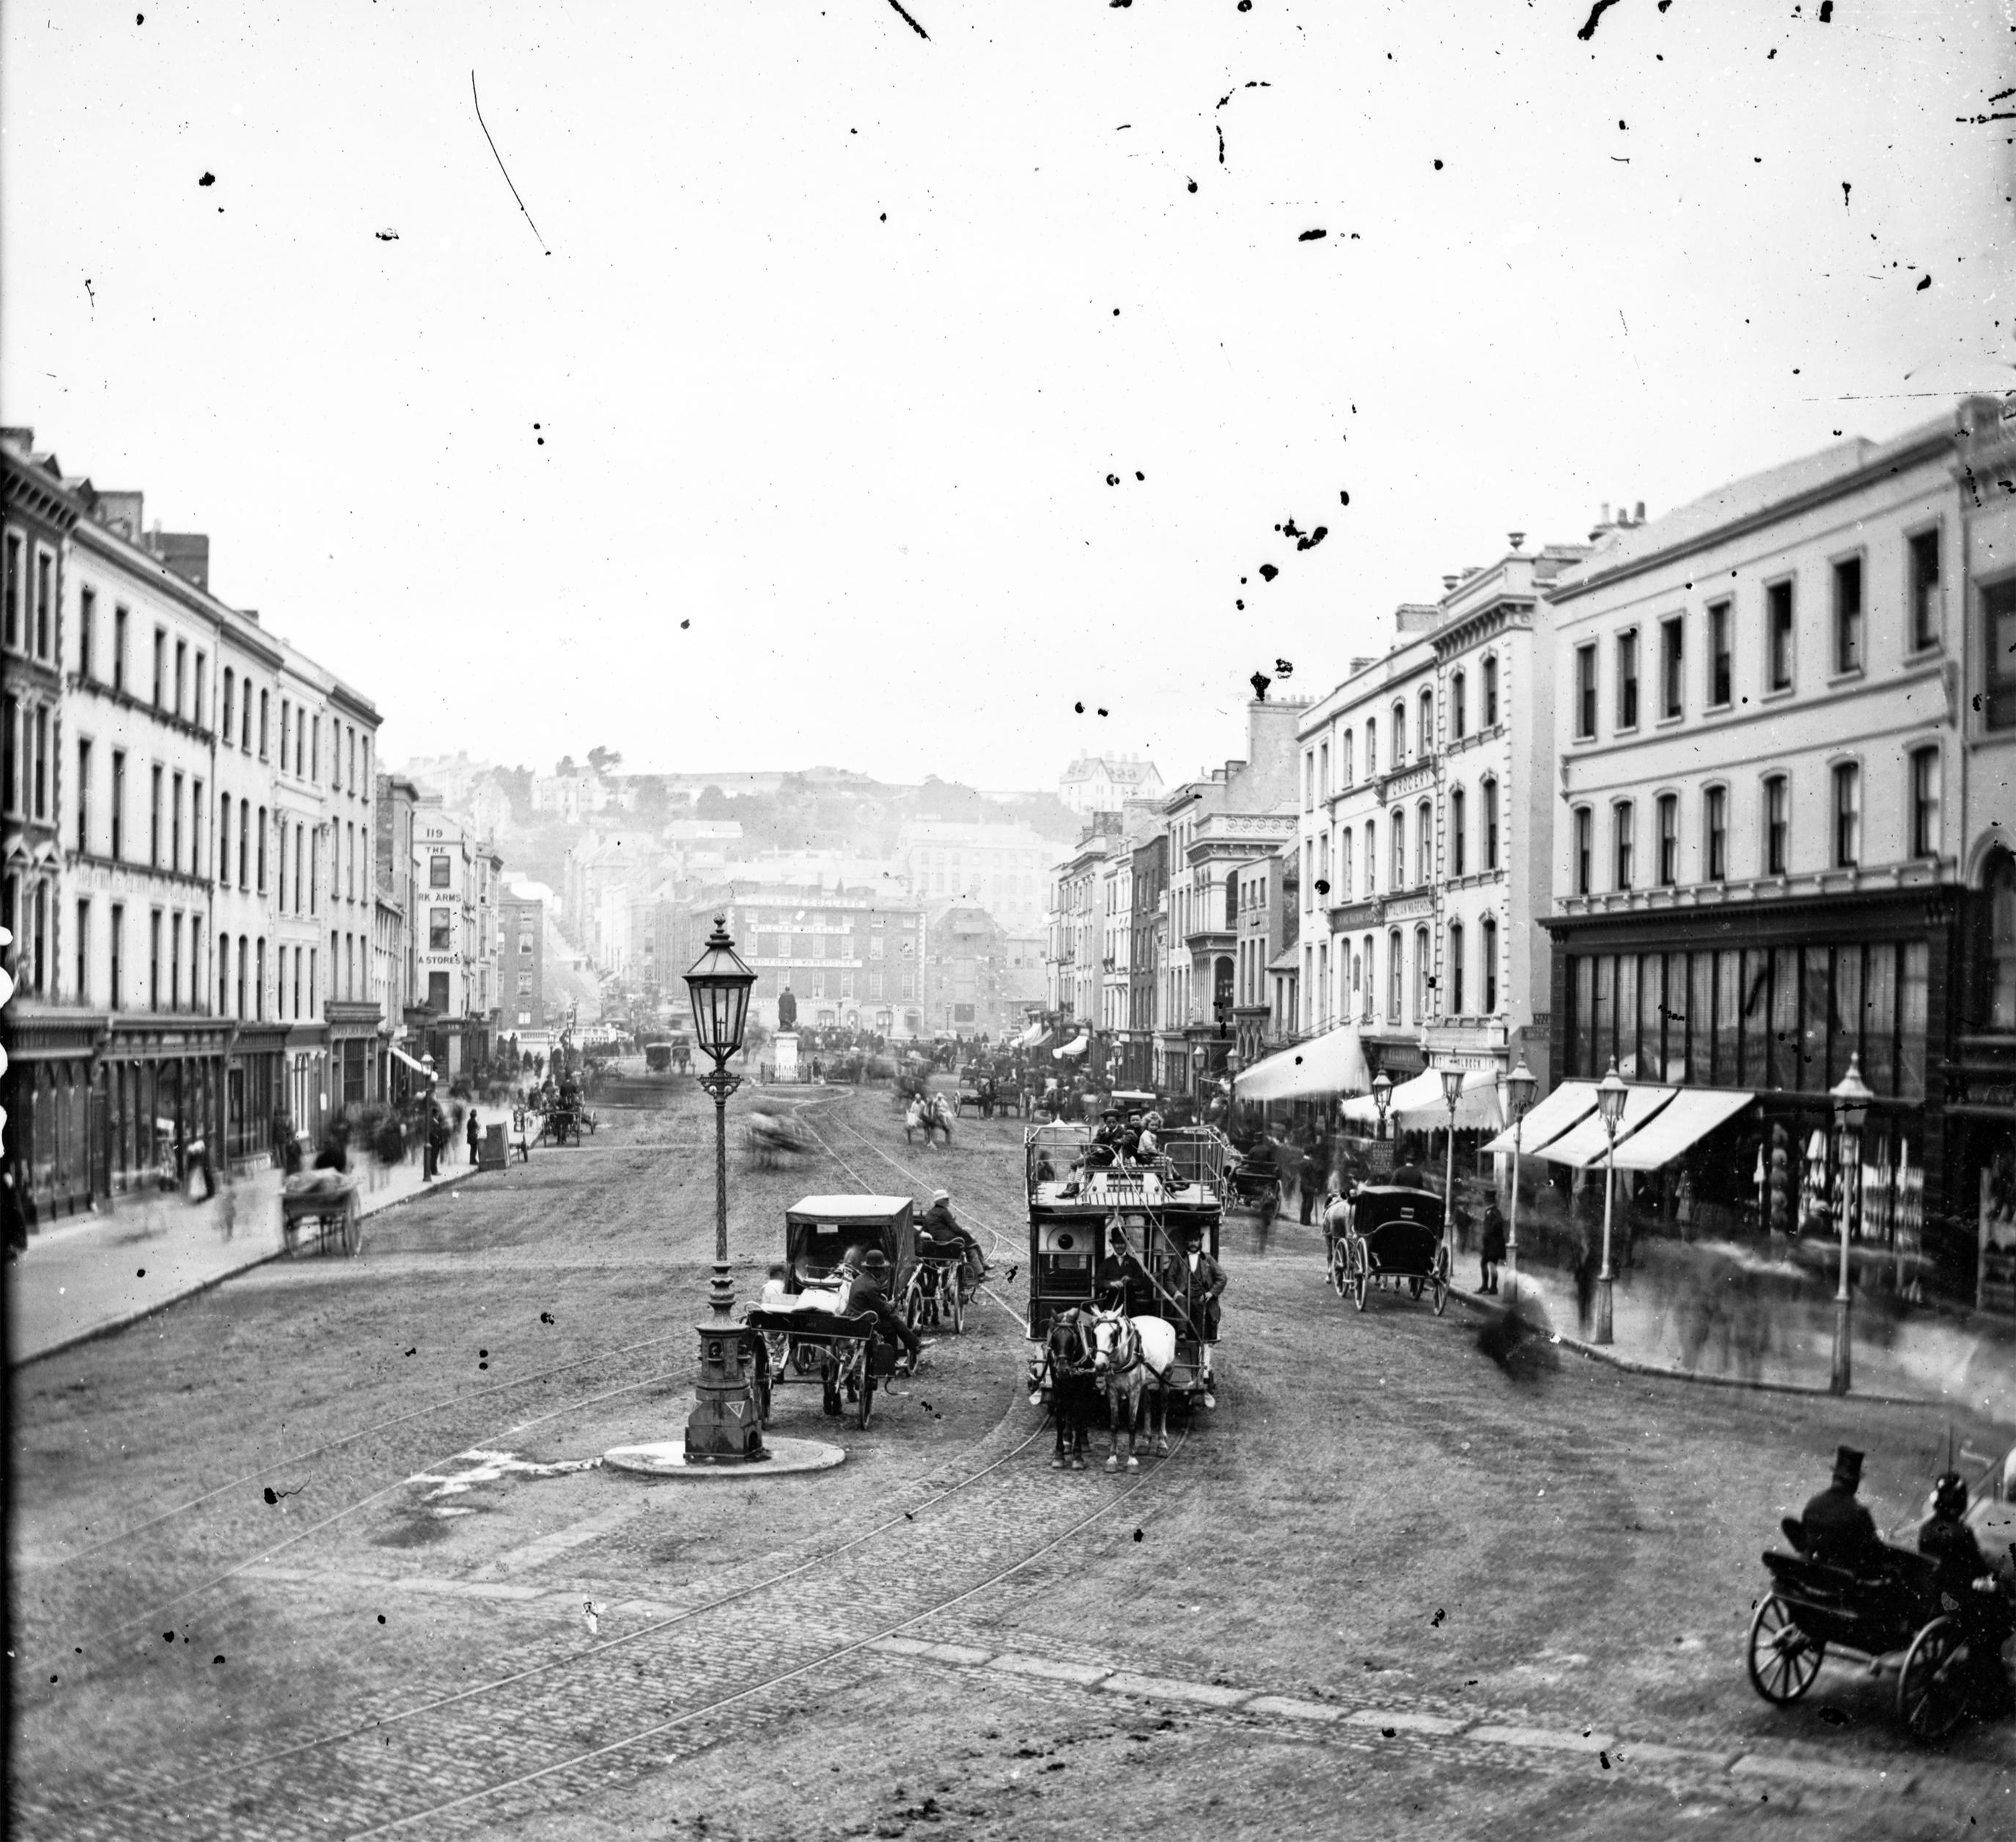 Horse-drawn tram, Patrick Street, Cork